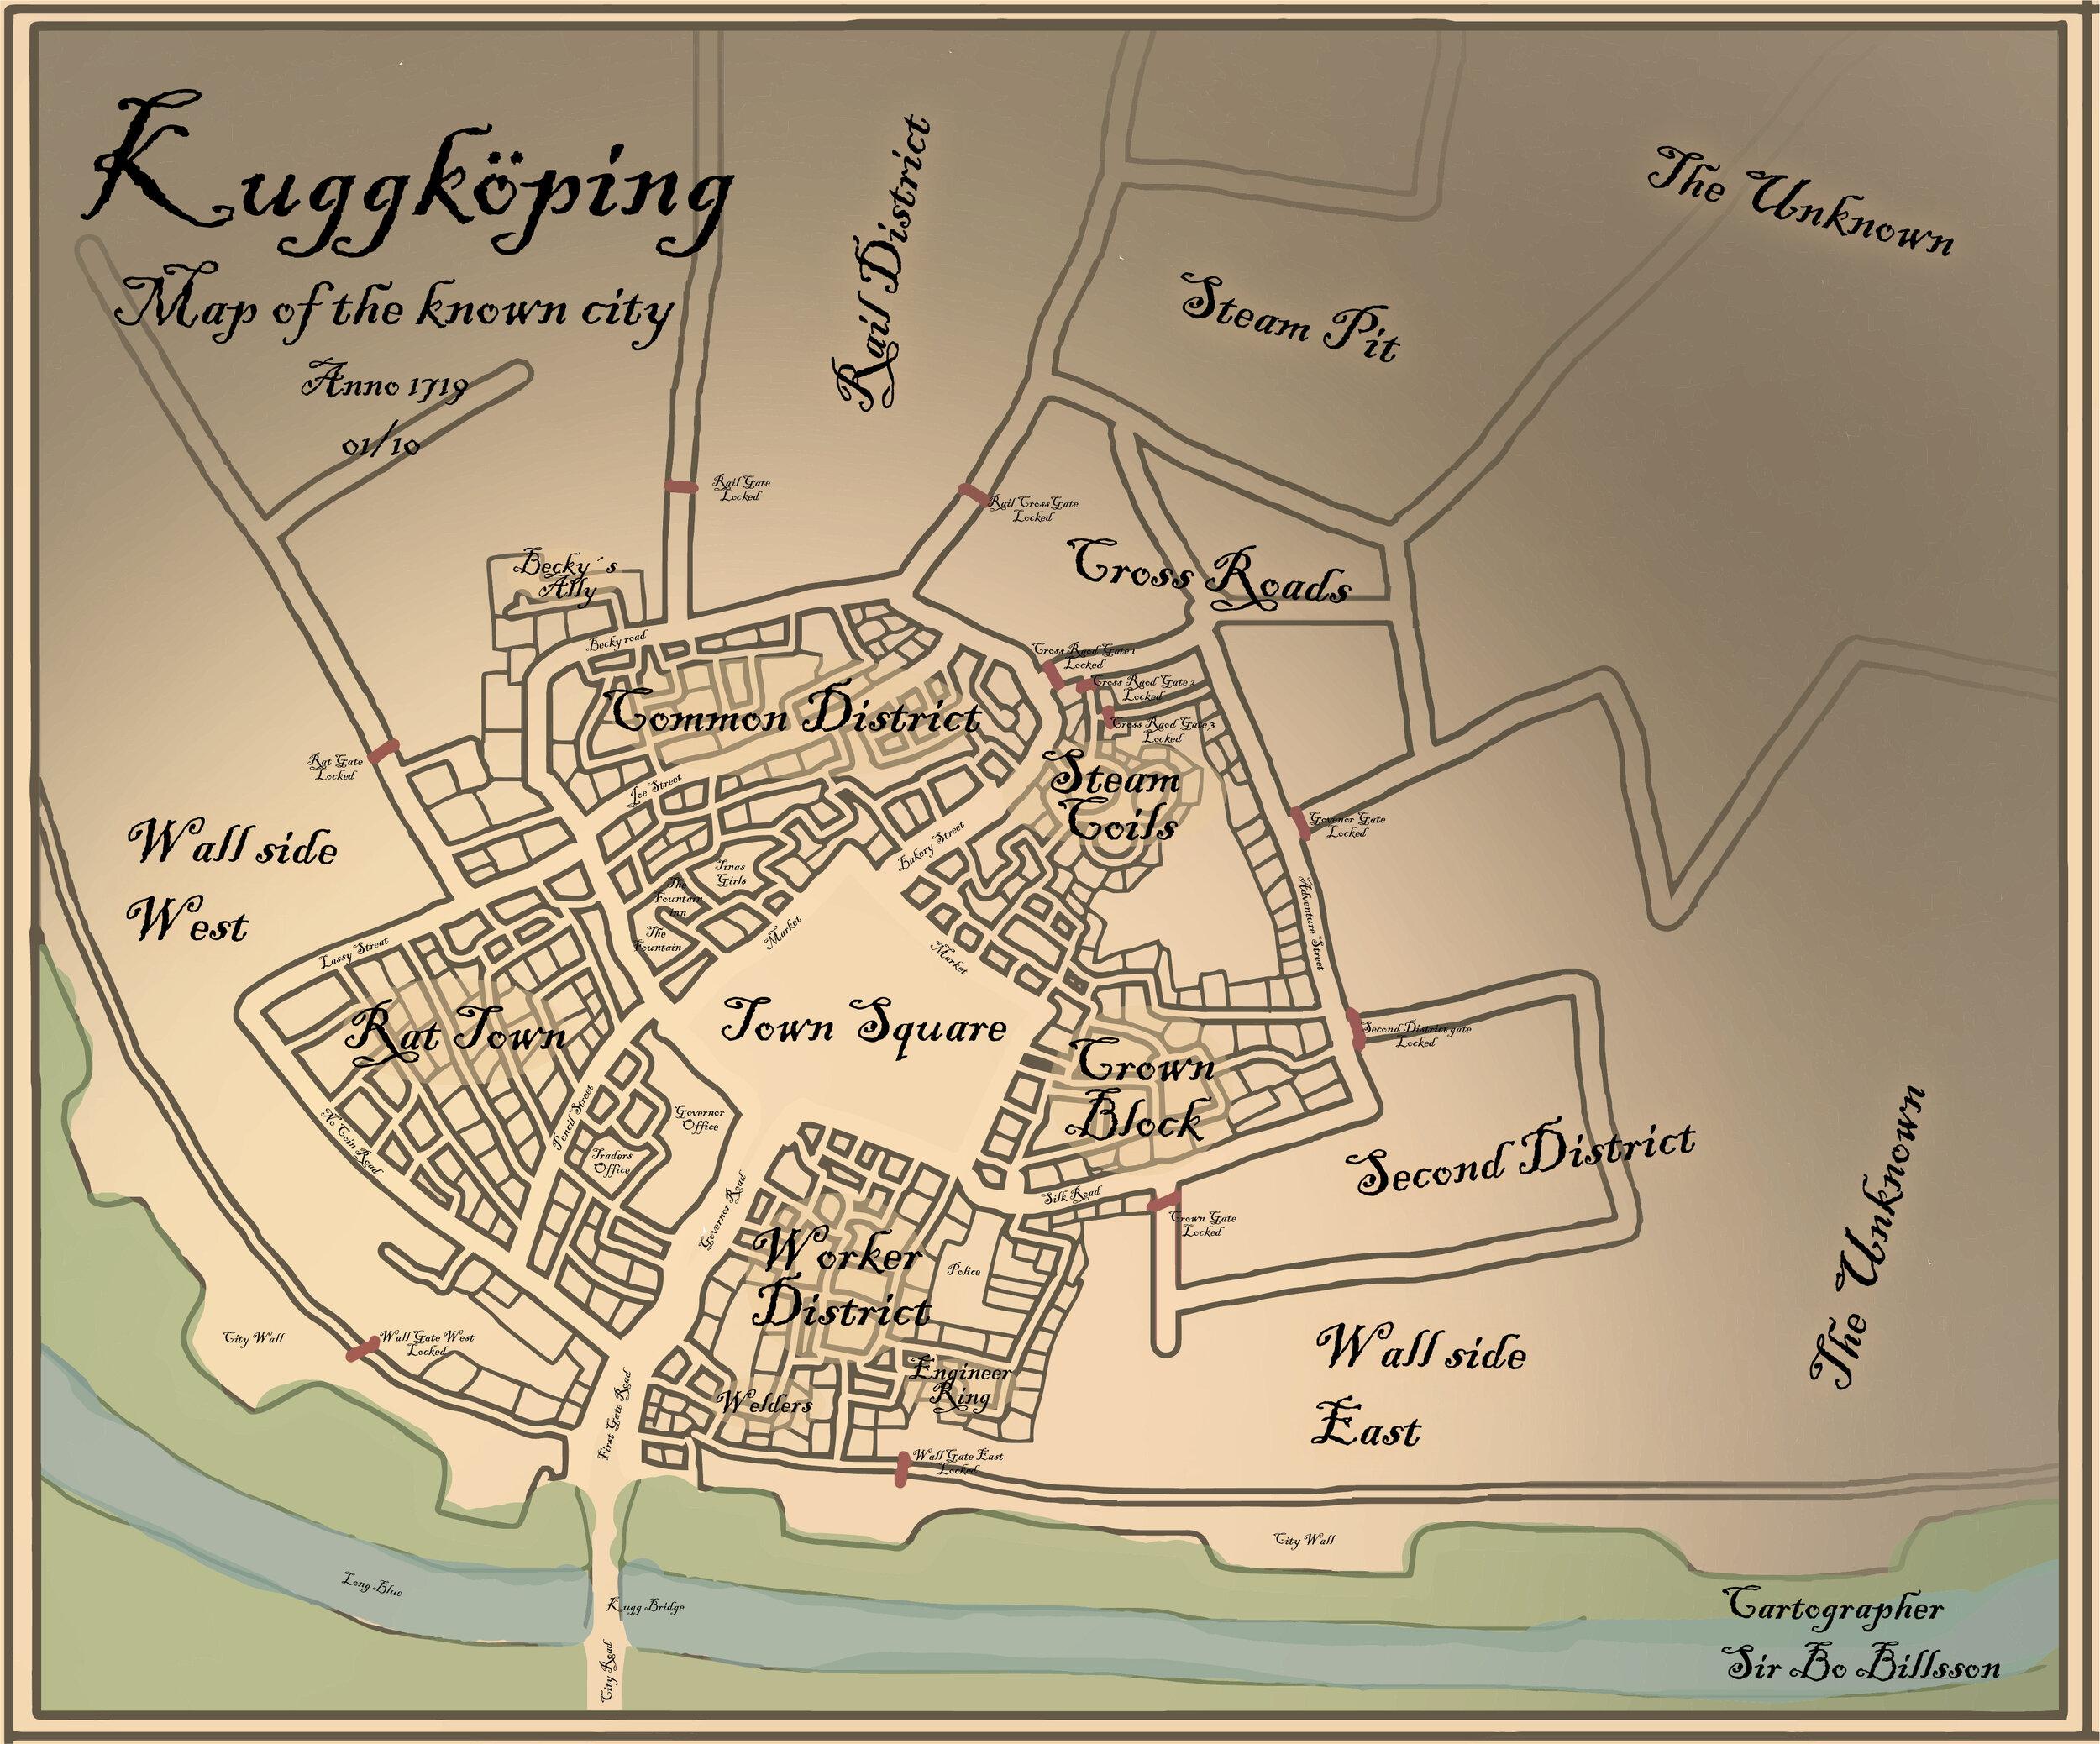 Kuggköping-City-map-Names-01.jpg